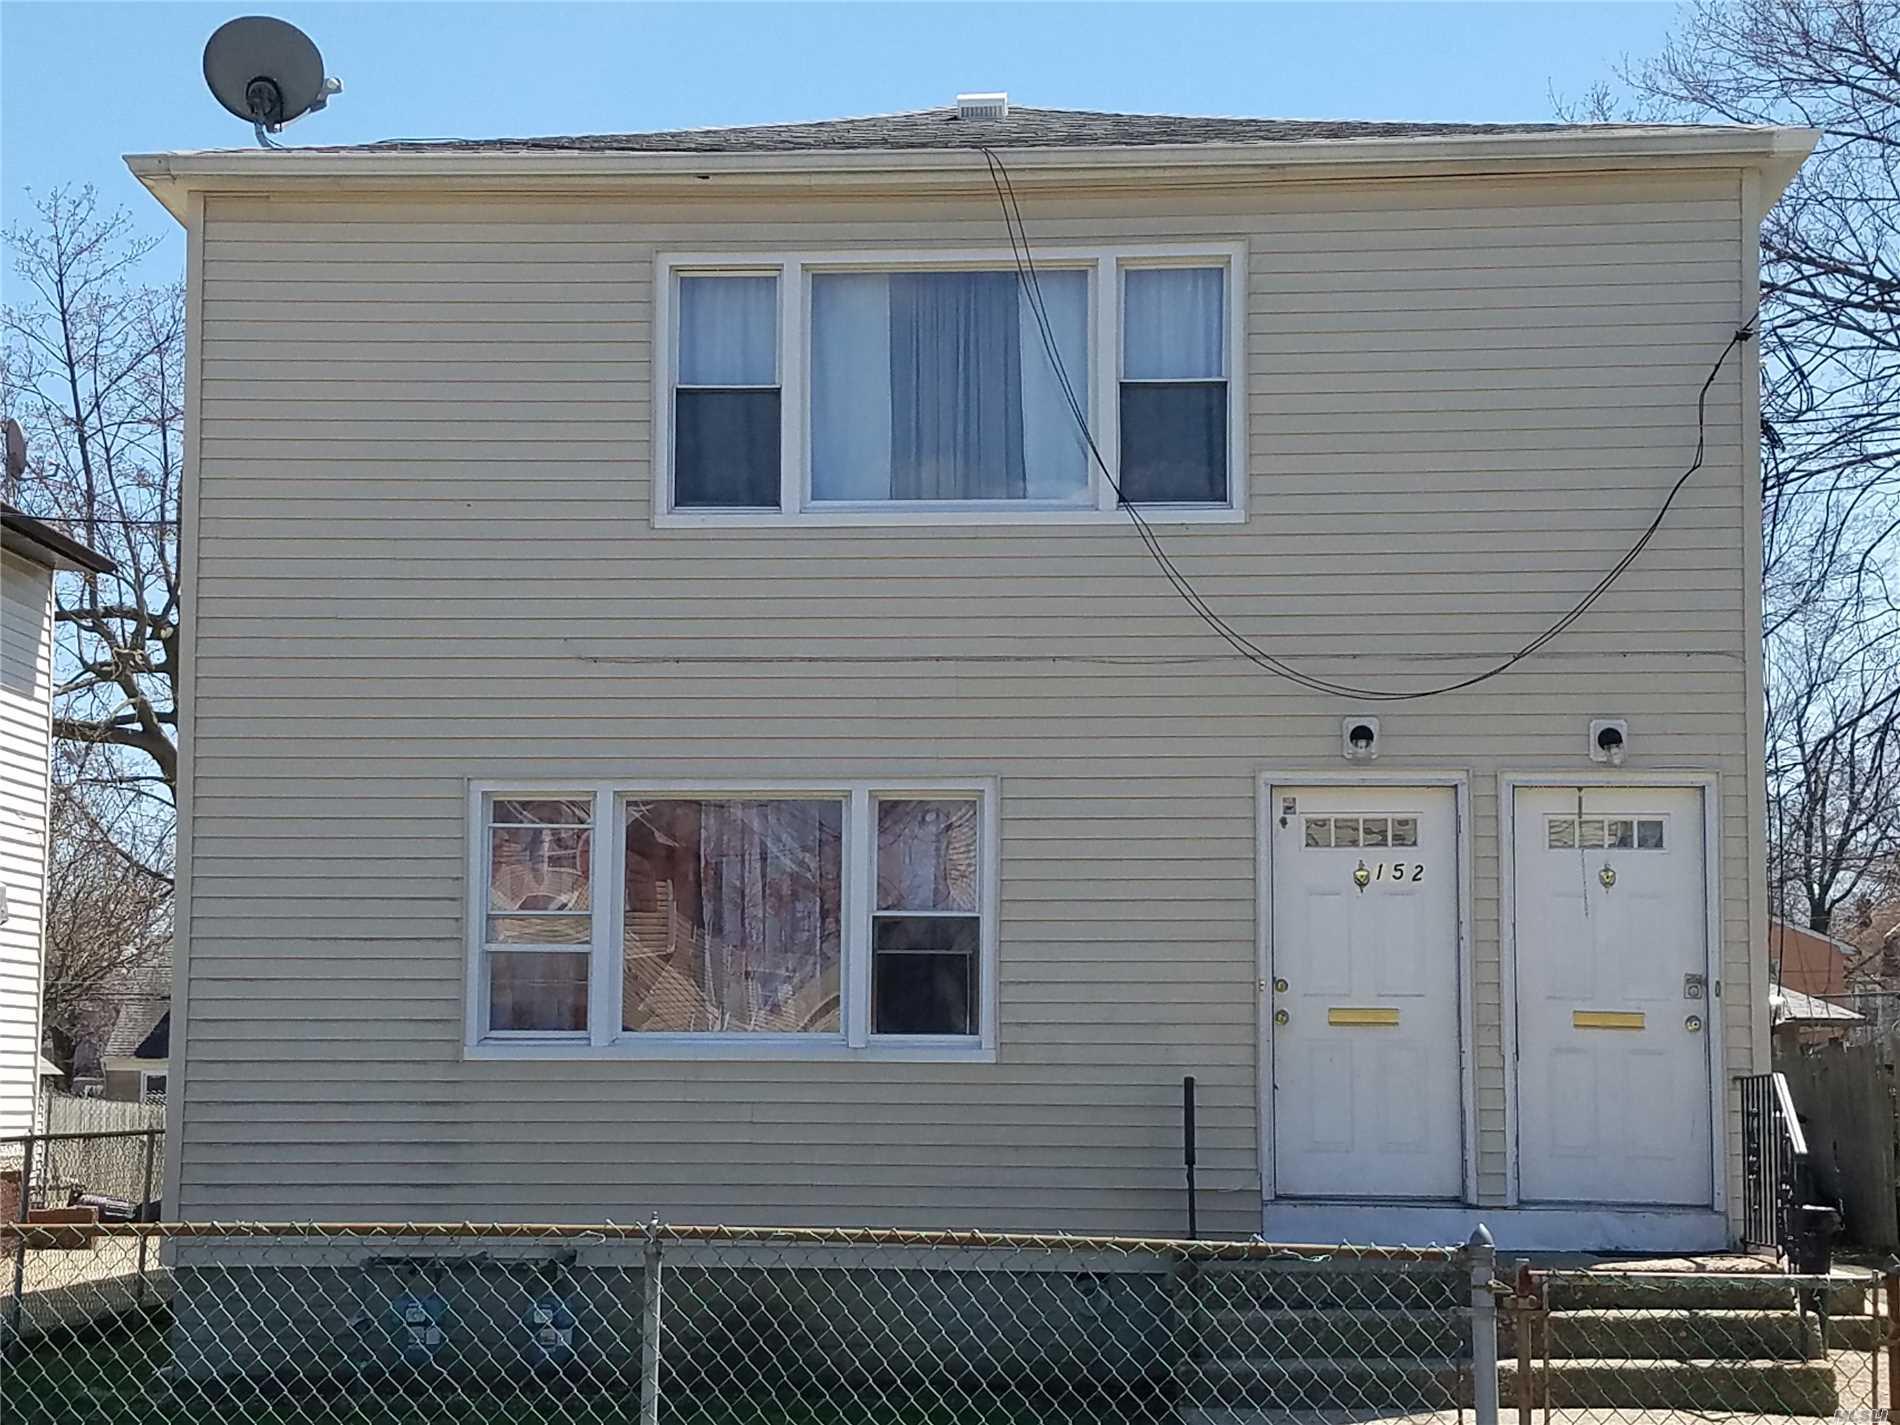 152 Wellesley St Hempstead, NY 11550